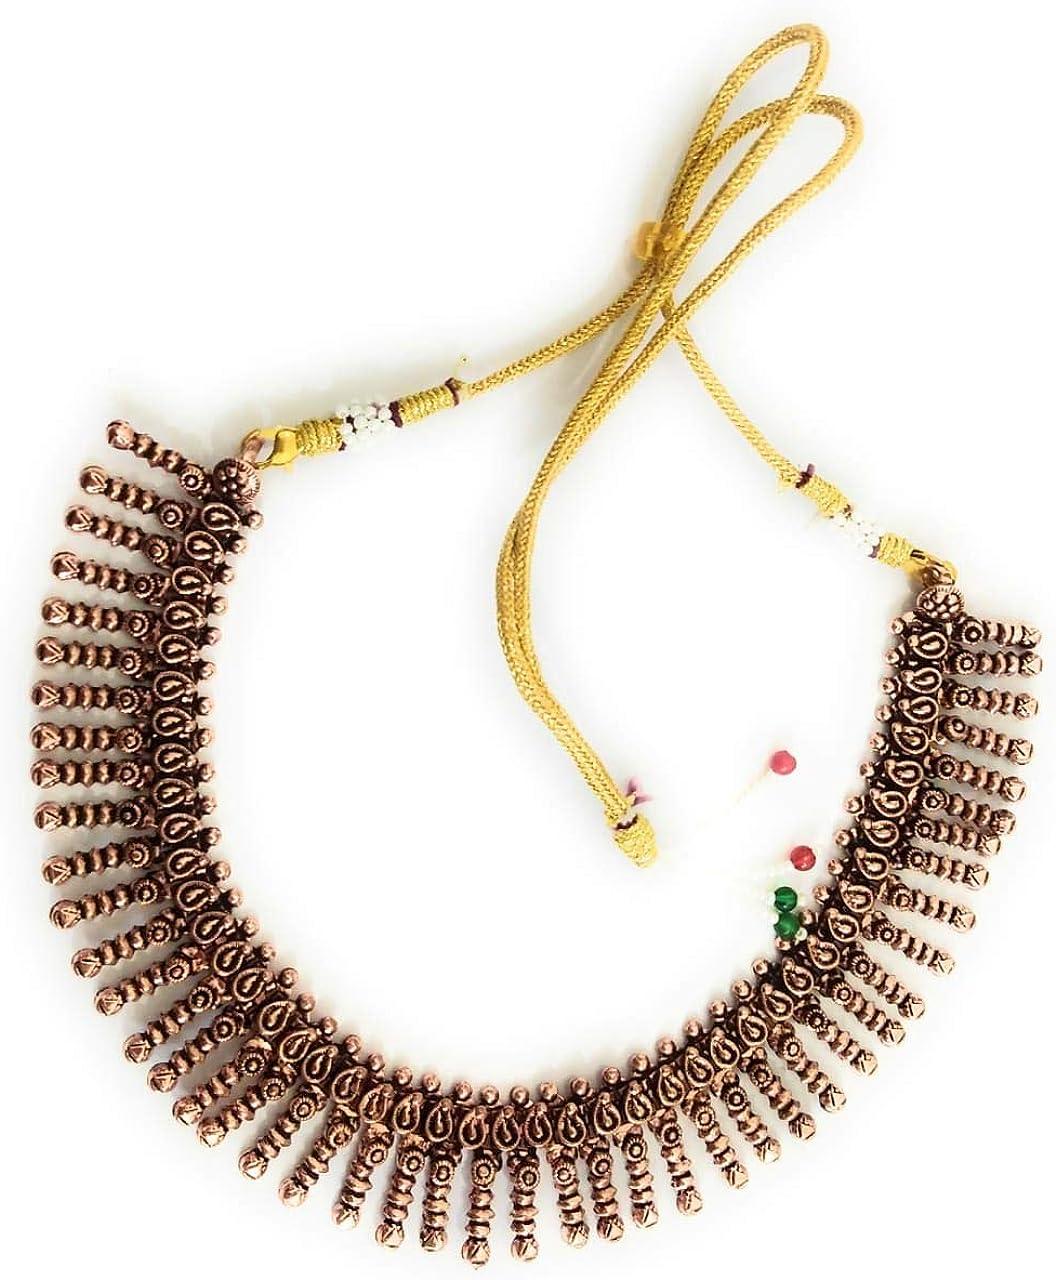 Indian Necklaces Copper oxidised Finish Copper Plated Golden Thread Ethnic Collar Indian Necklaces Premium Ethnic Festival Copper Beads Thread India Garba, Navratri, Diwali Women Fashion Jewellery